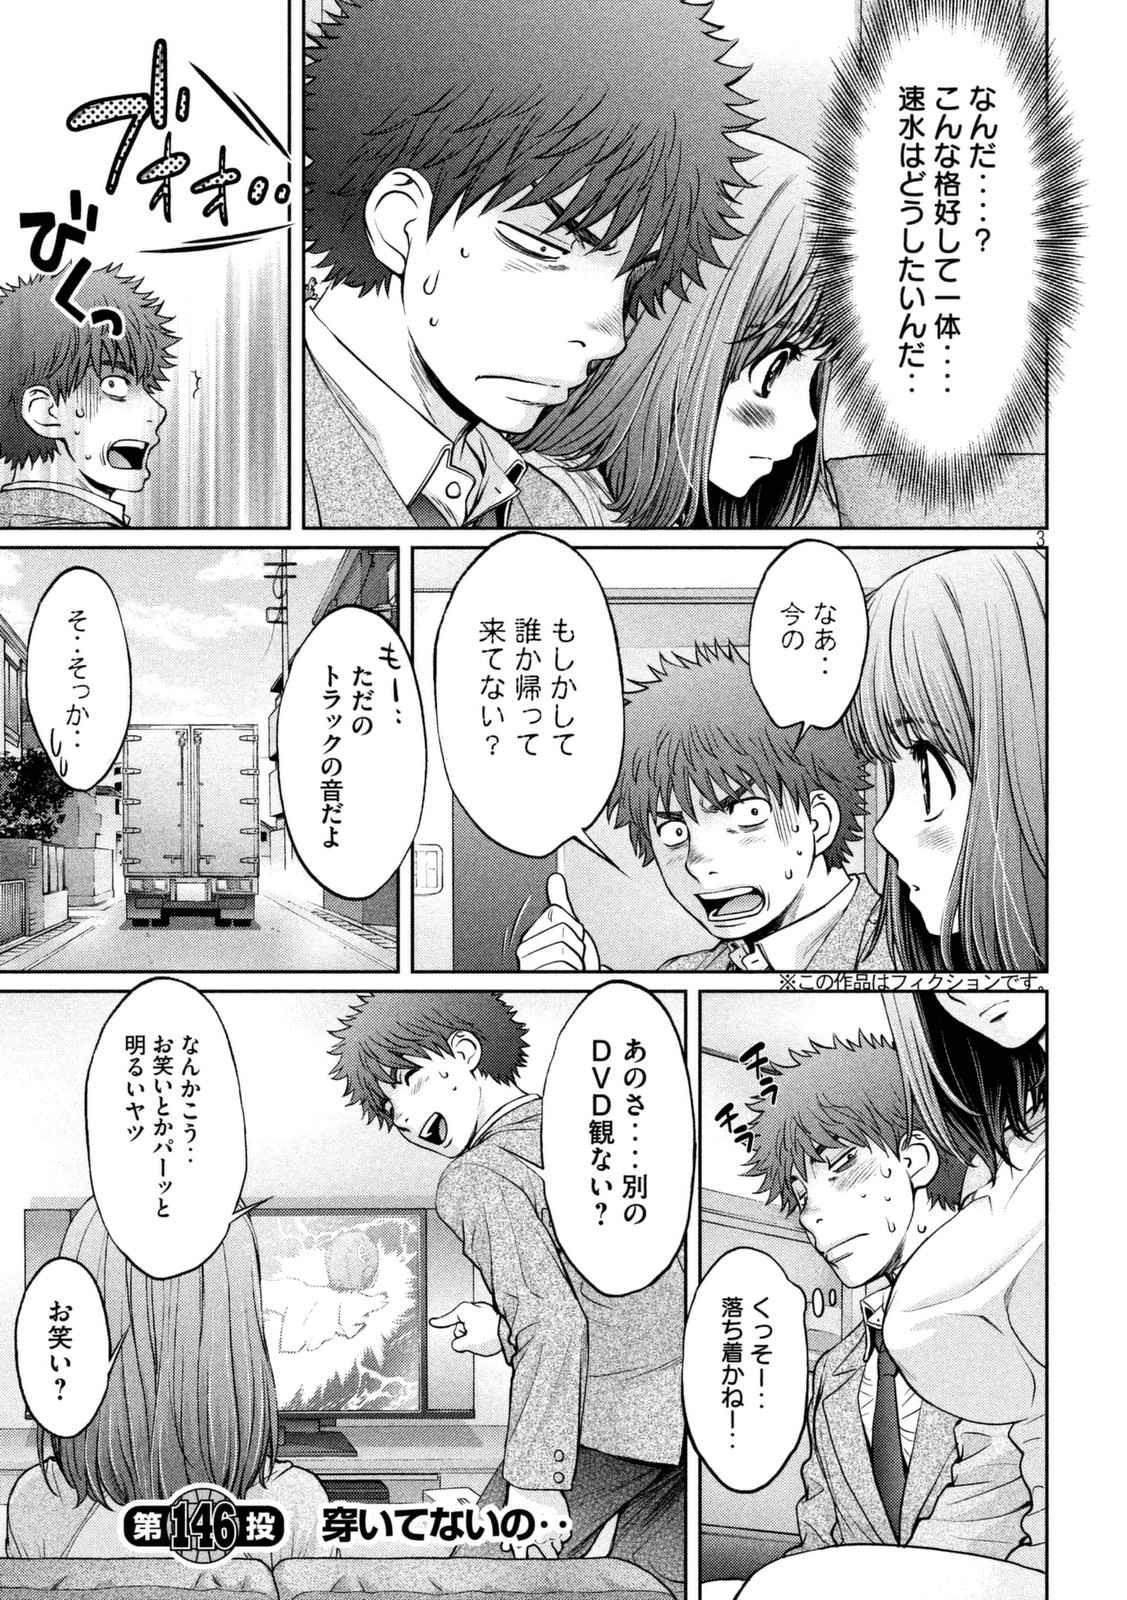 Hantsu x Trash - Chapter 146 - Page 3